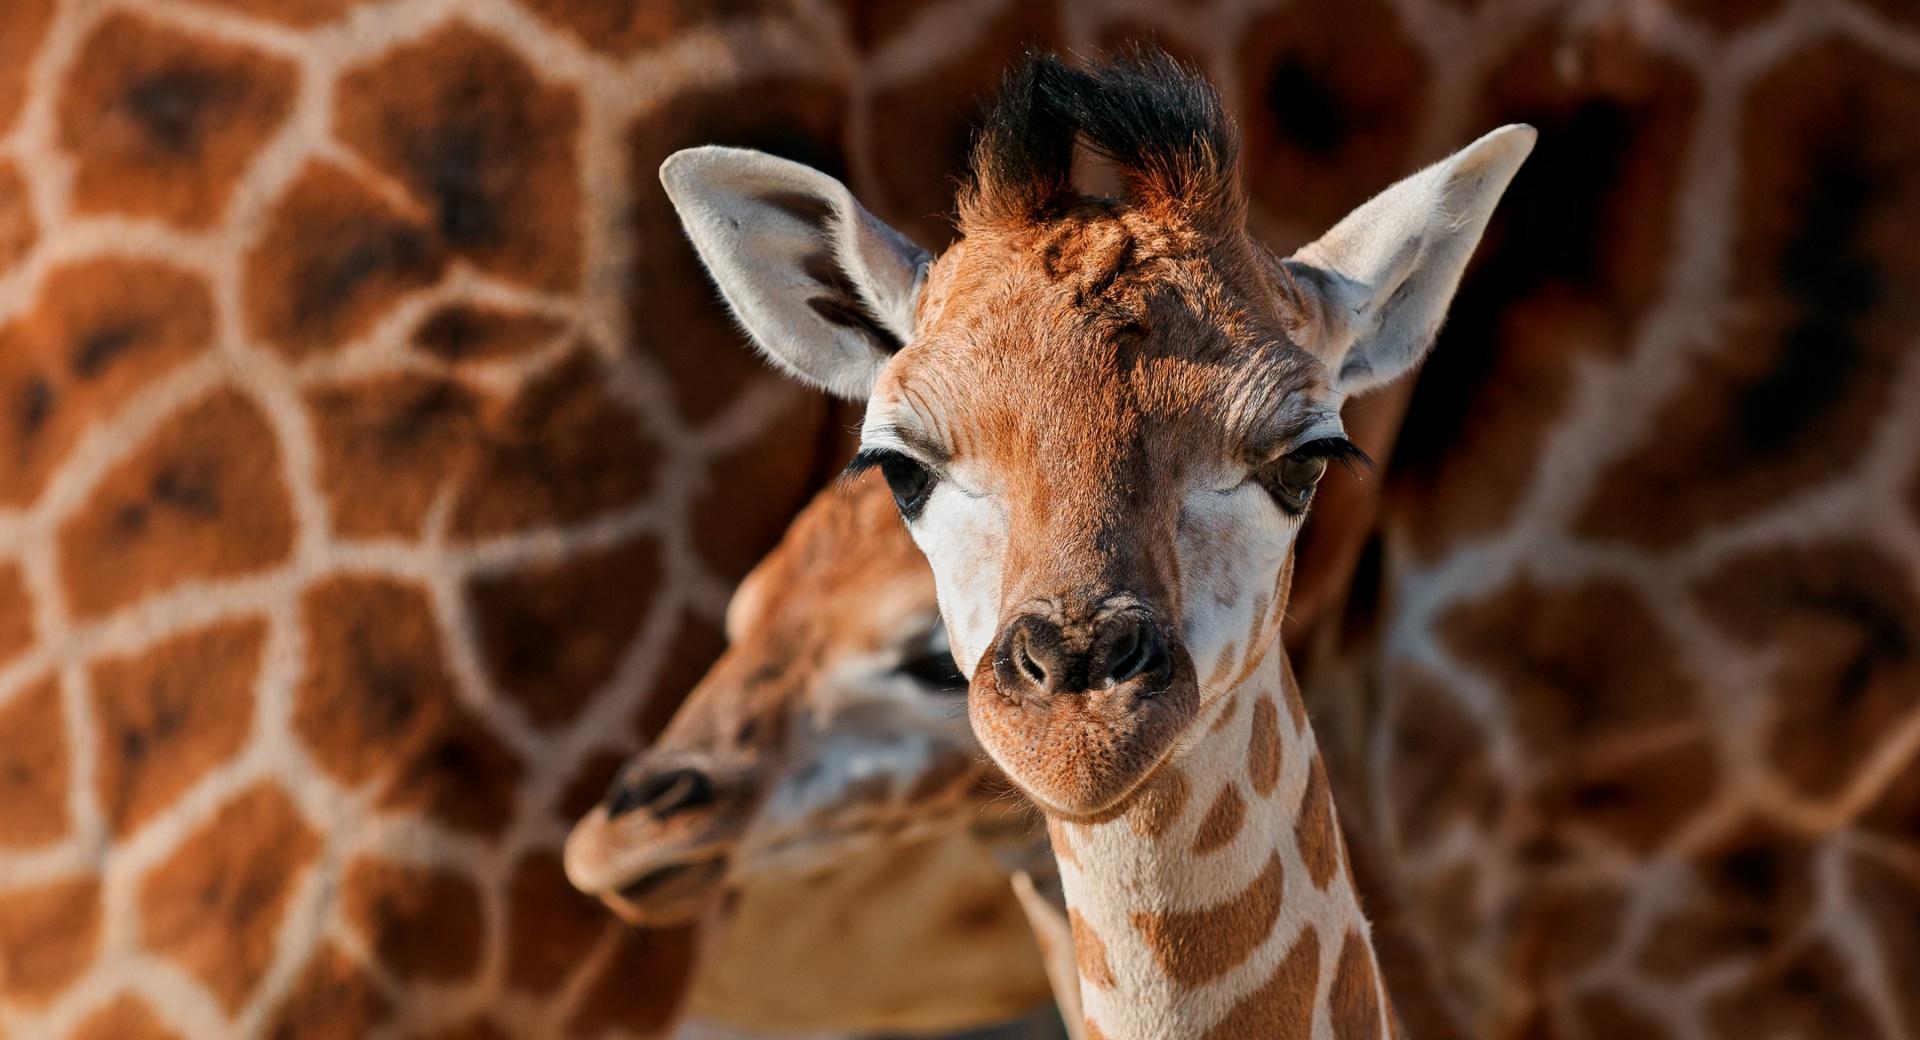 Young Giraffe wallpapers HD quality